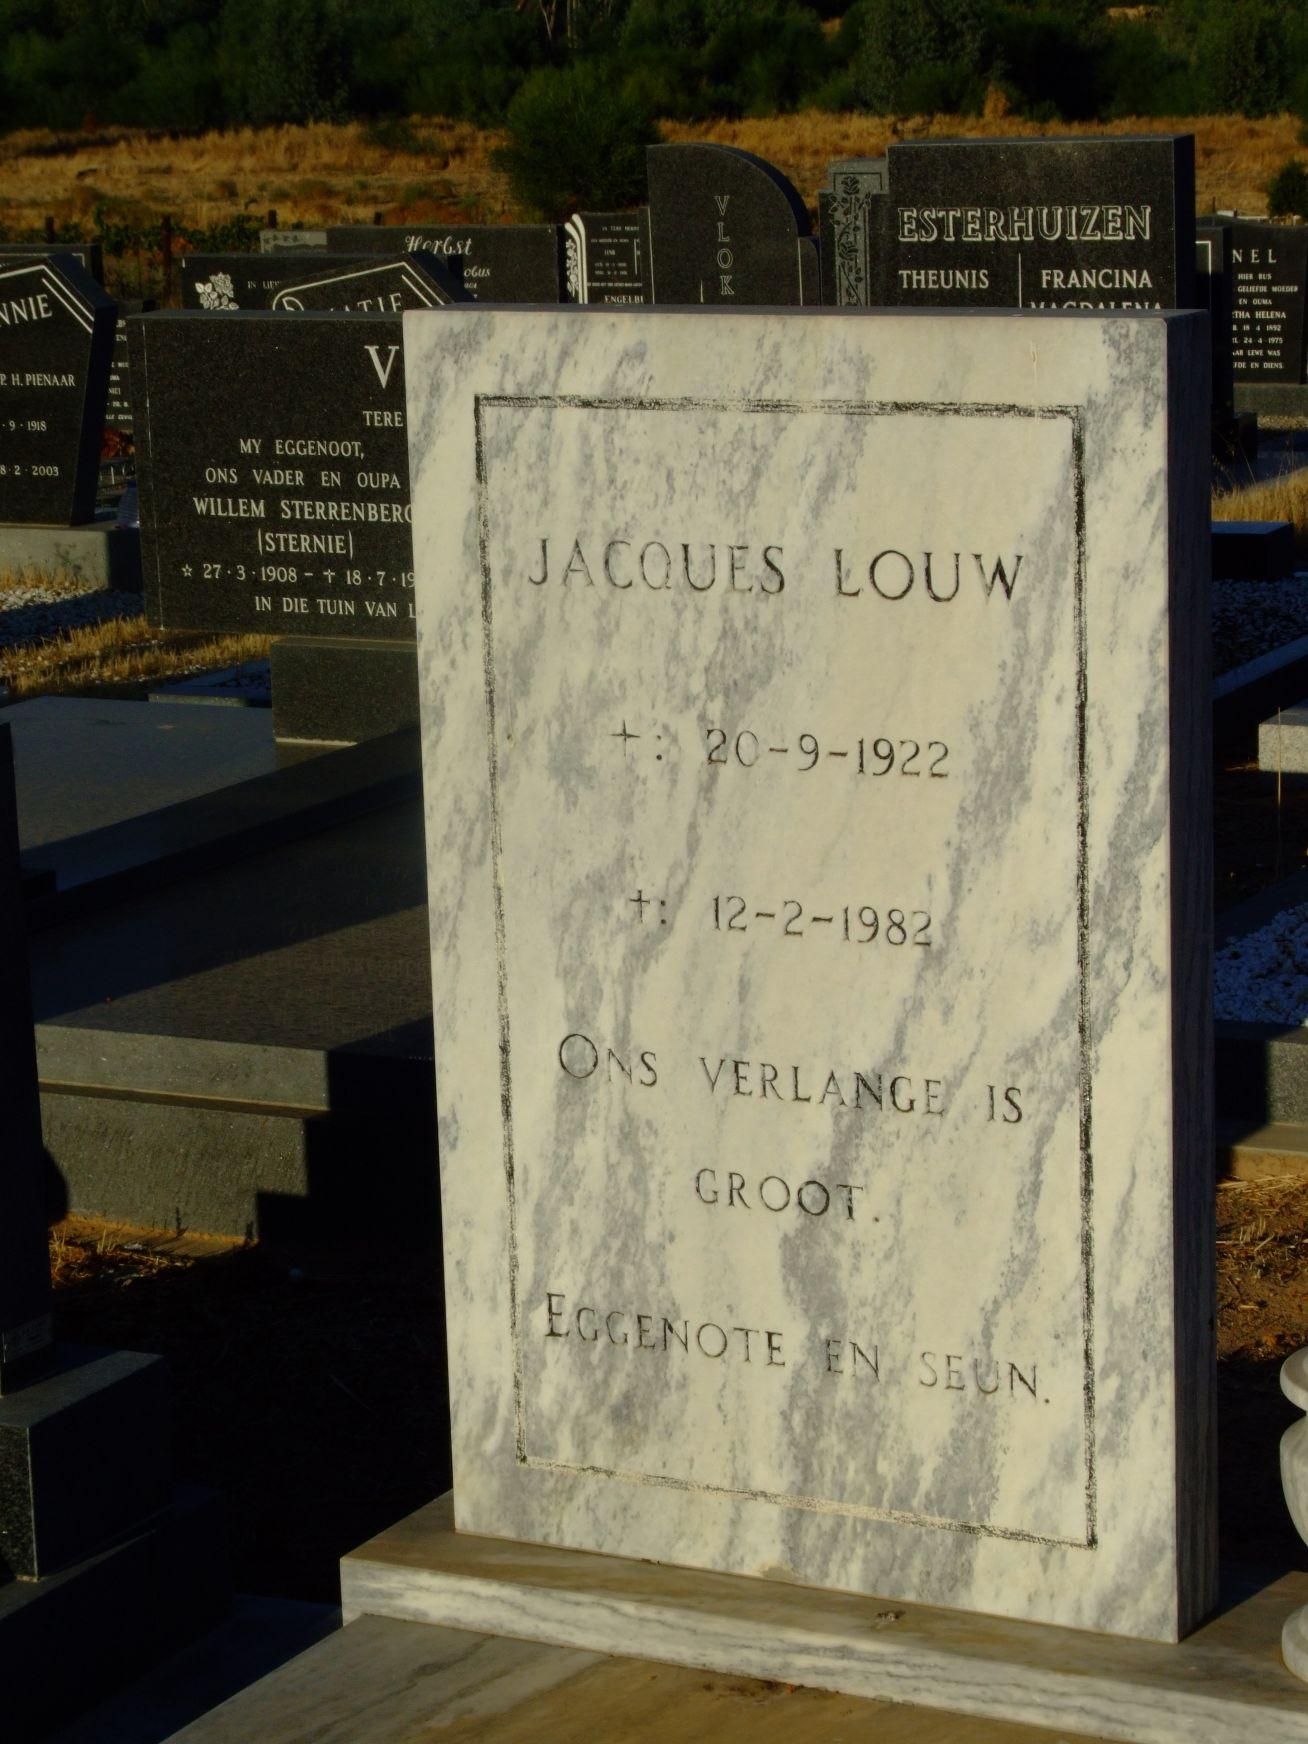 Louw, Jacques